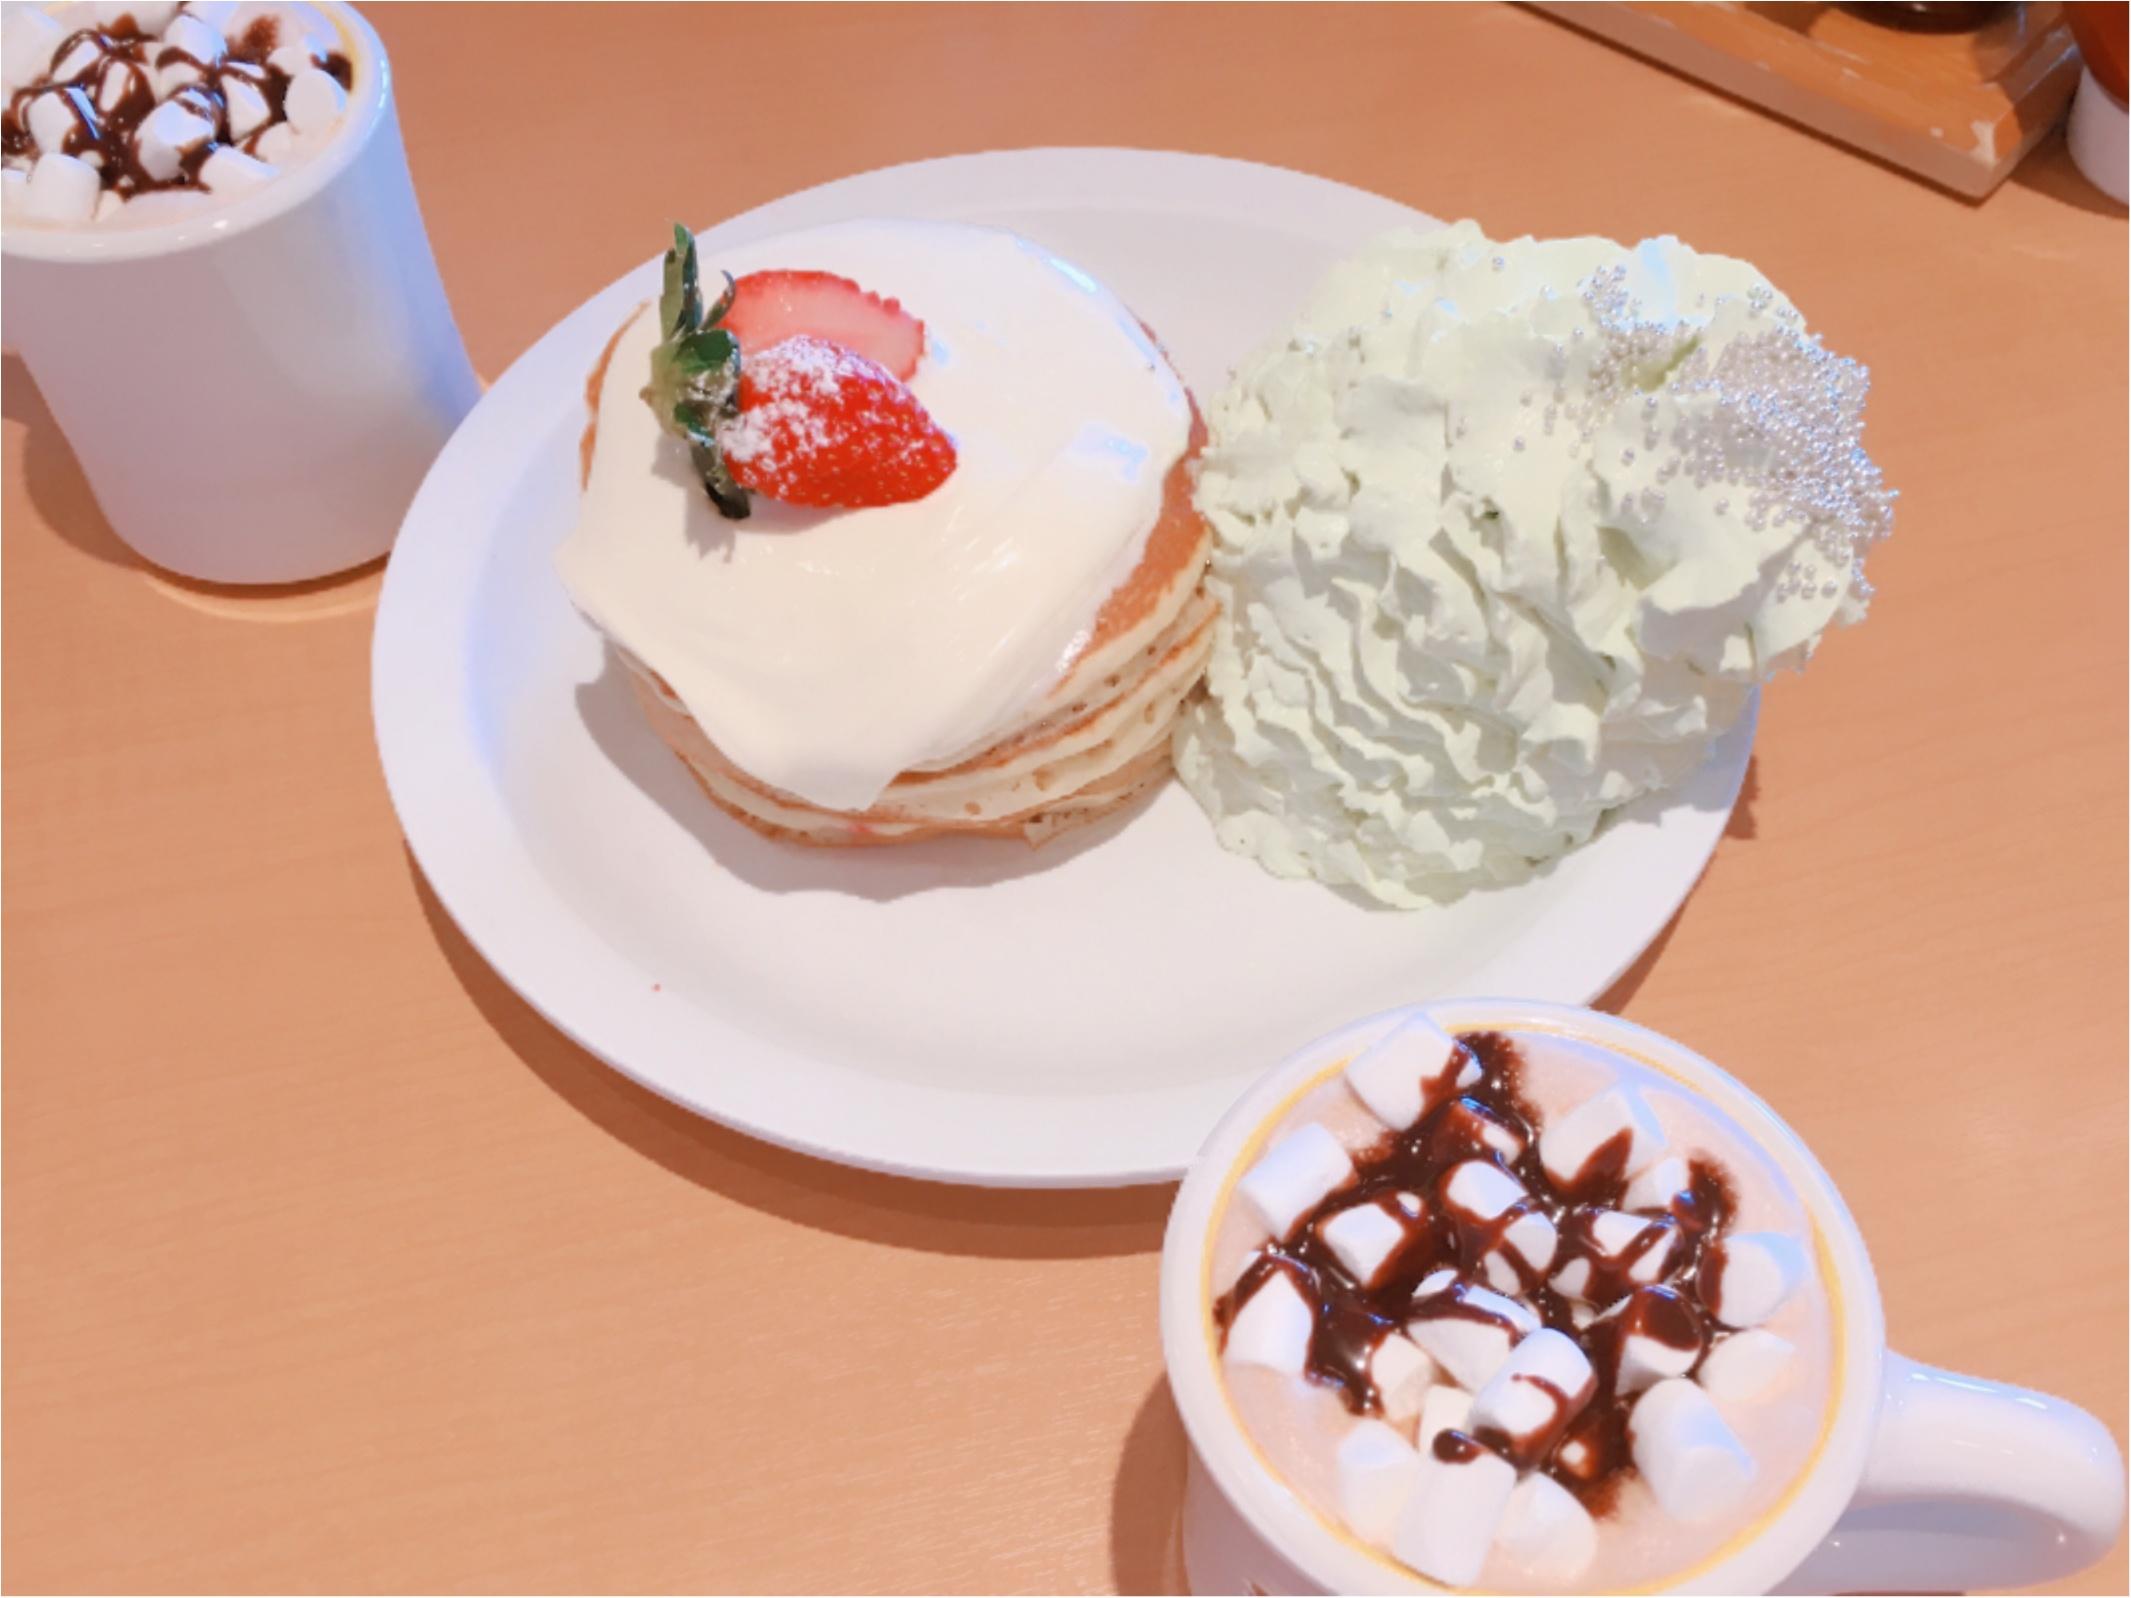 【Eggs'n Things(エッグスンシングス)】クリスマス限定パンケーキはツリーも一緒♡_1